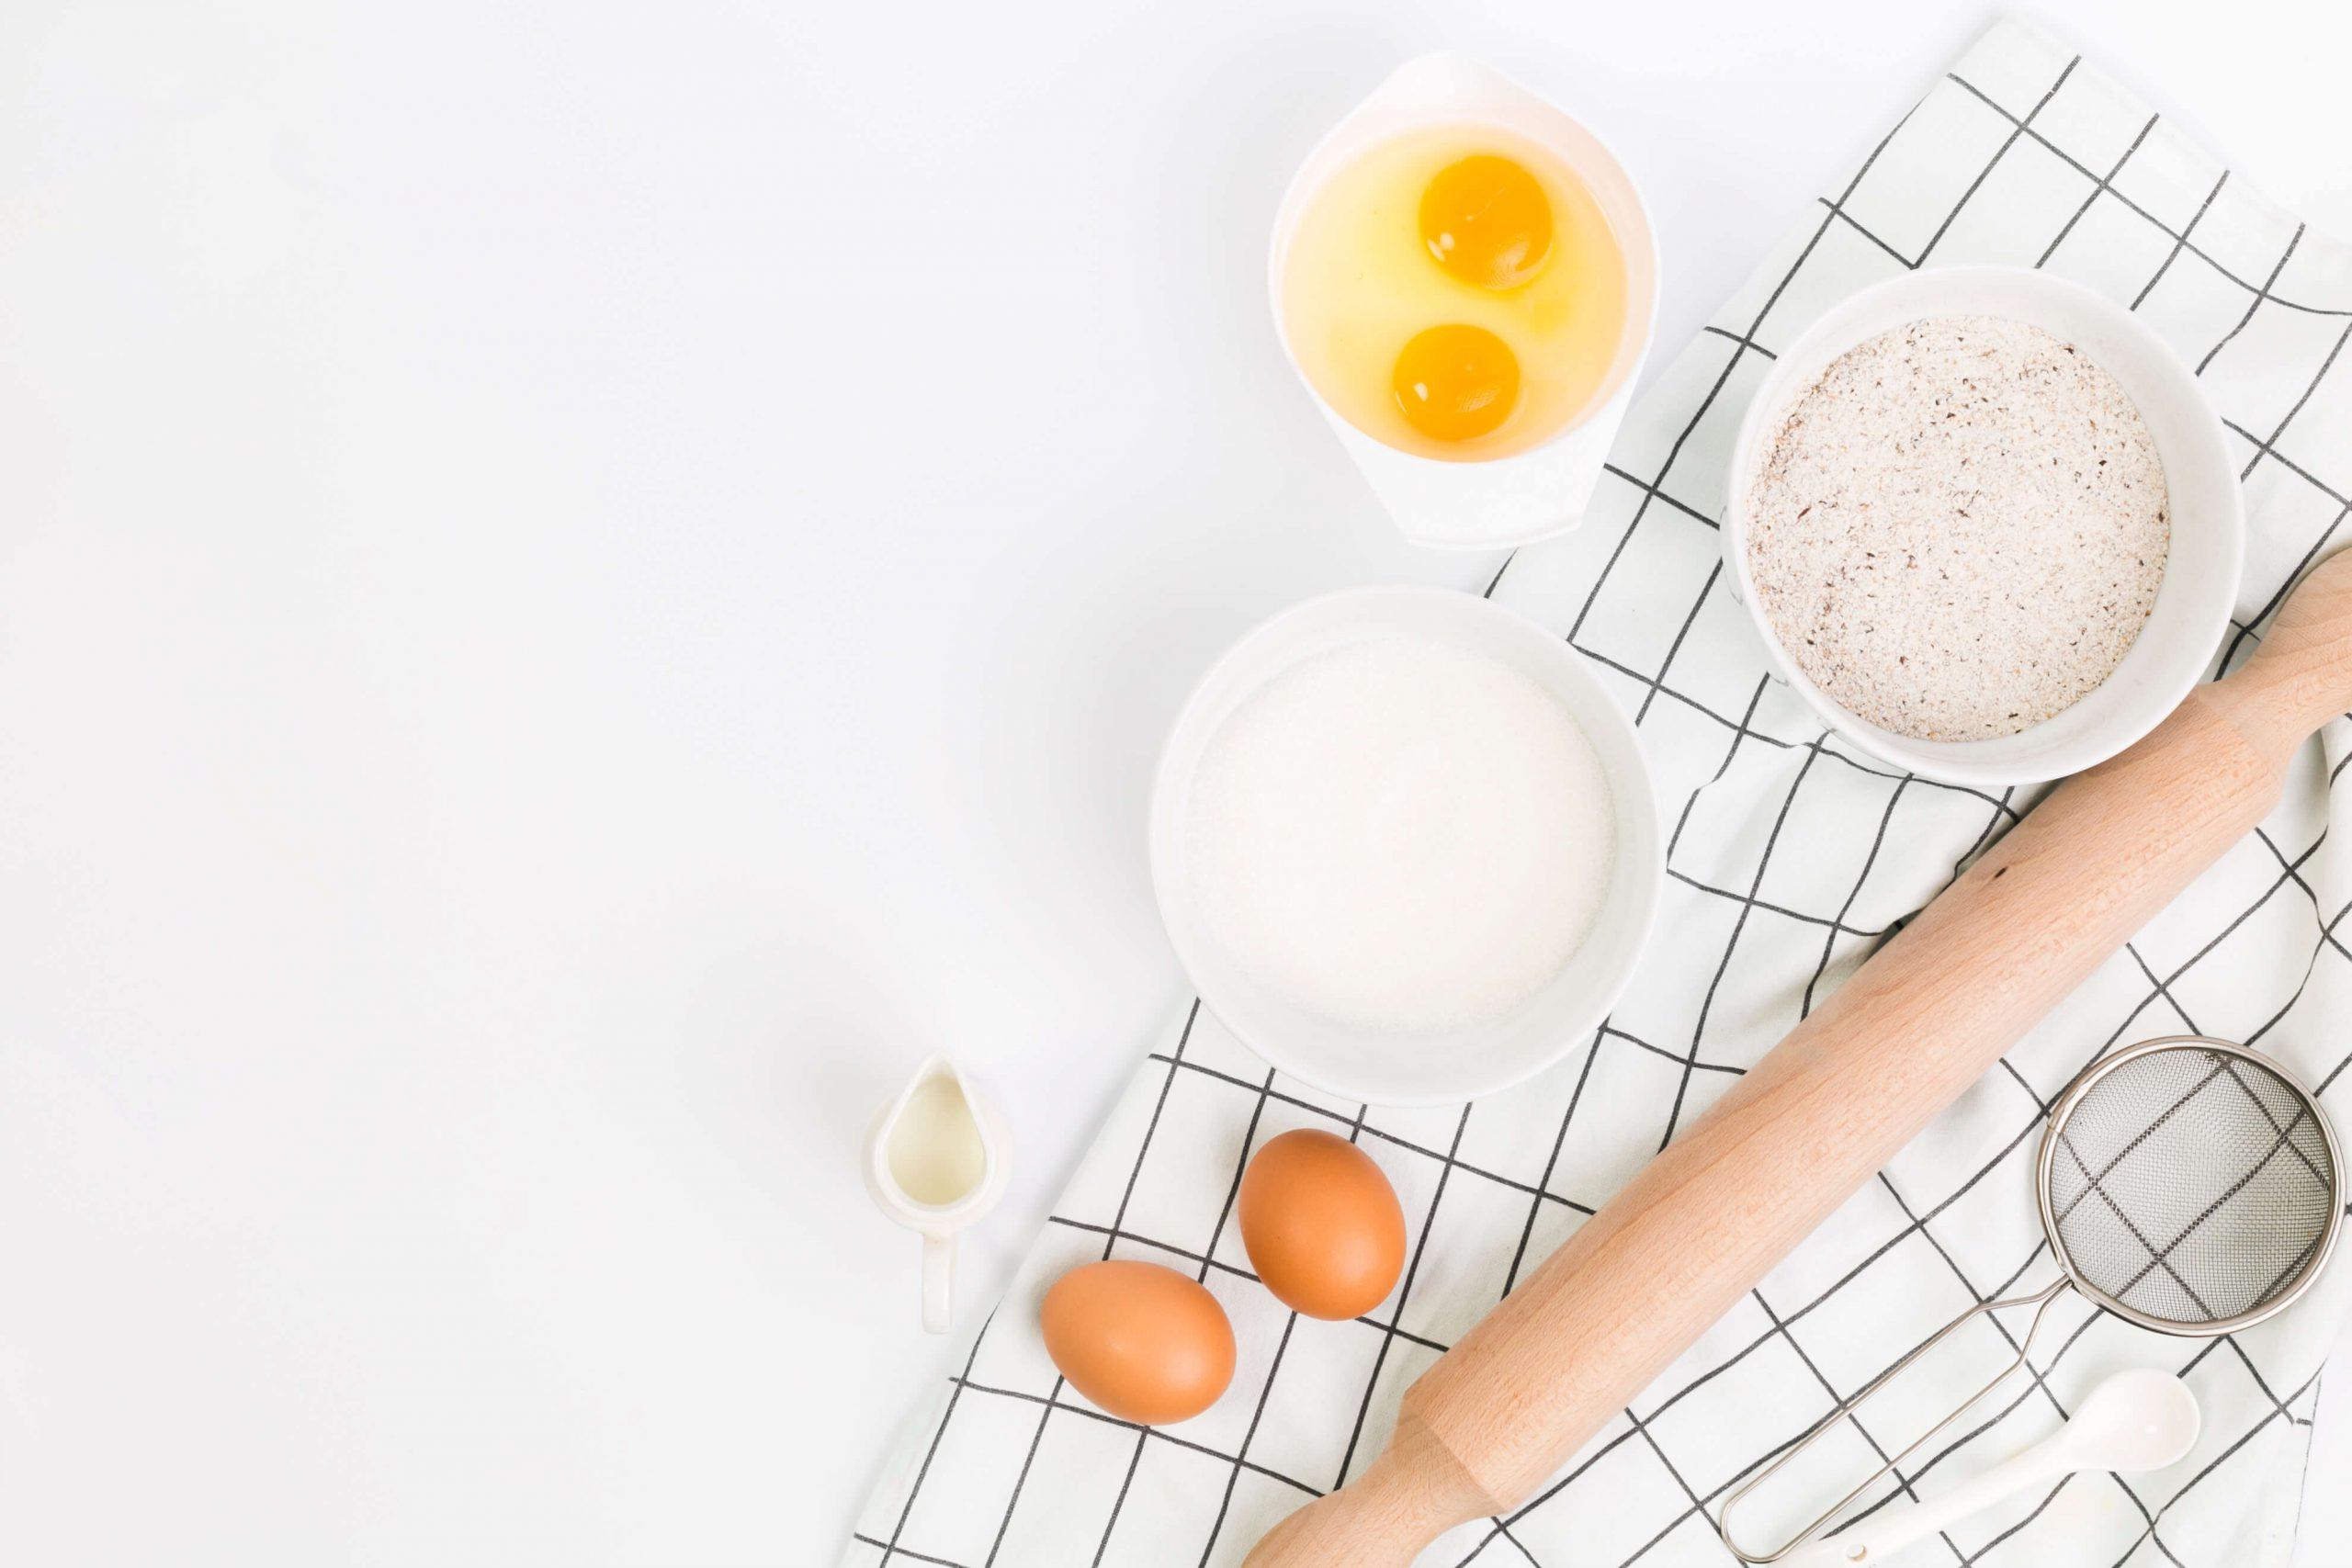 volovanes de huevo ecológico con gamba